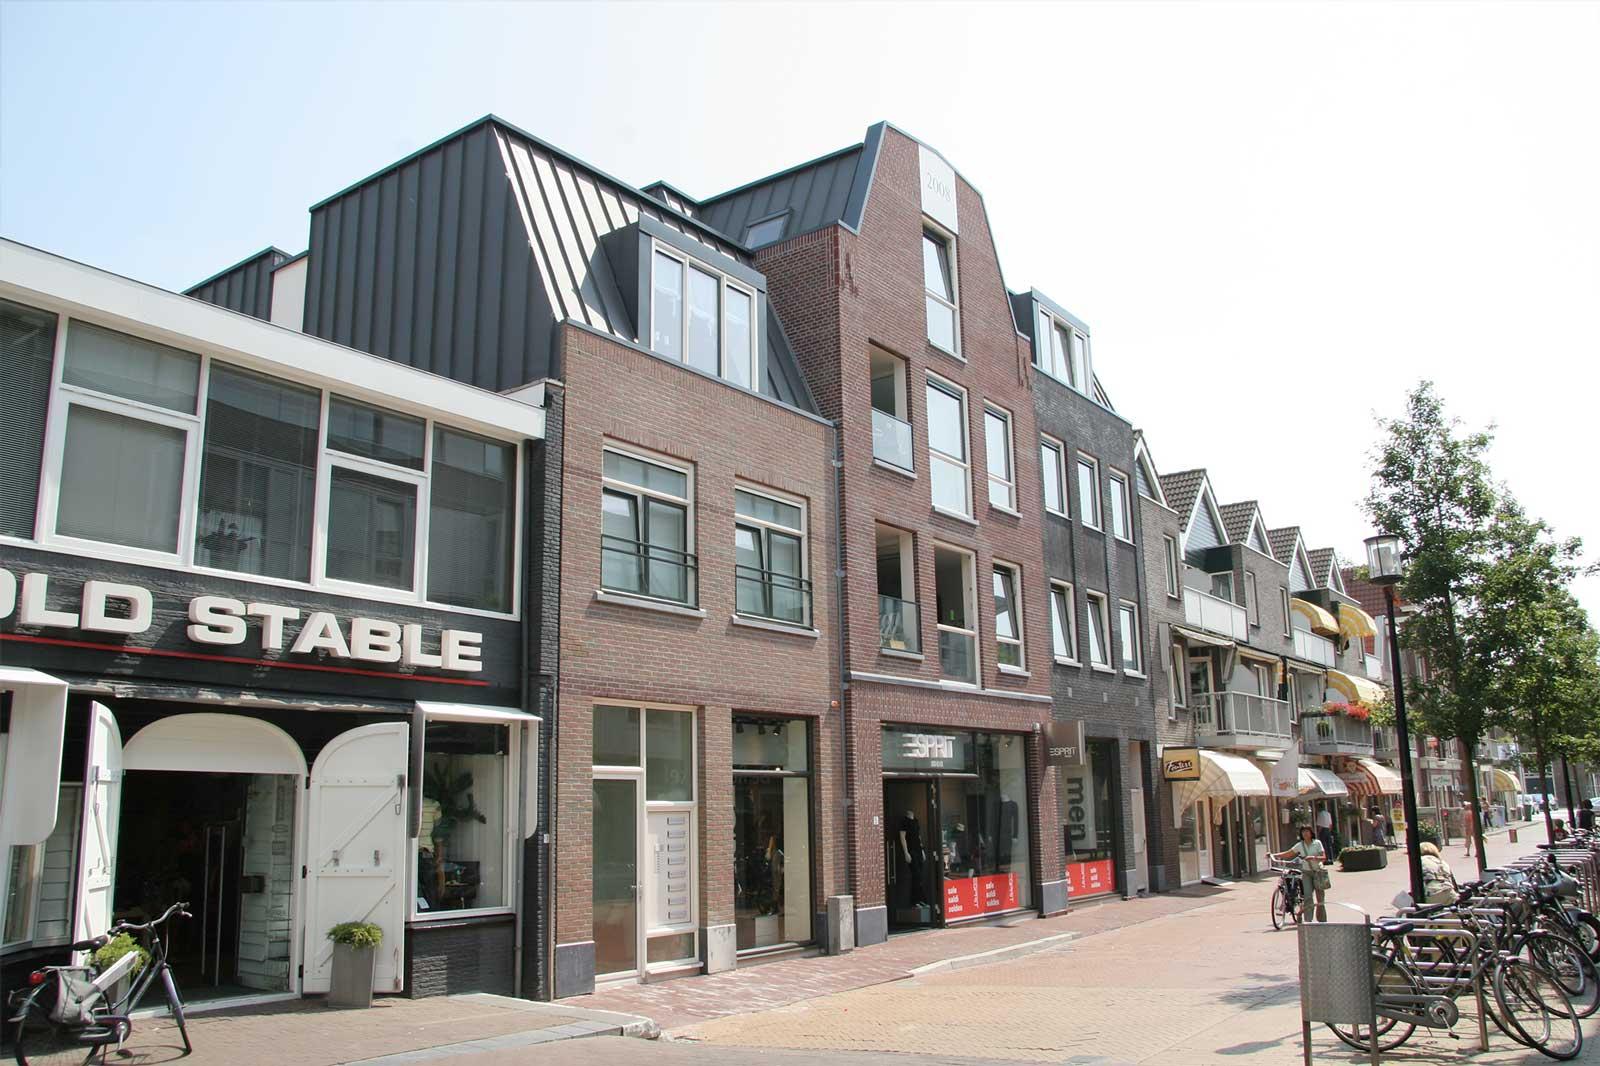 voorgevel - wooncomlex Plantsoenstraat Purmerend